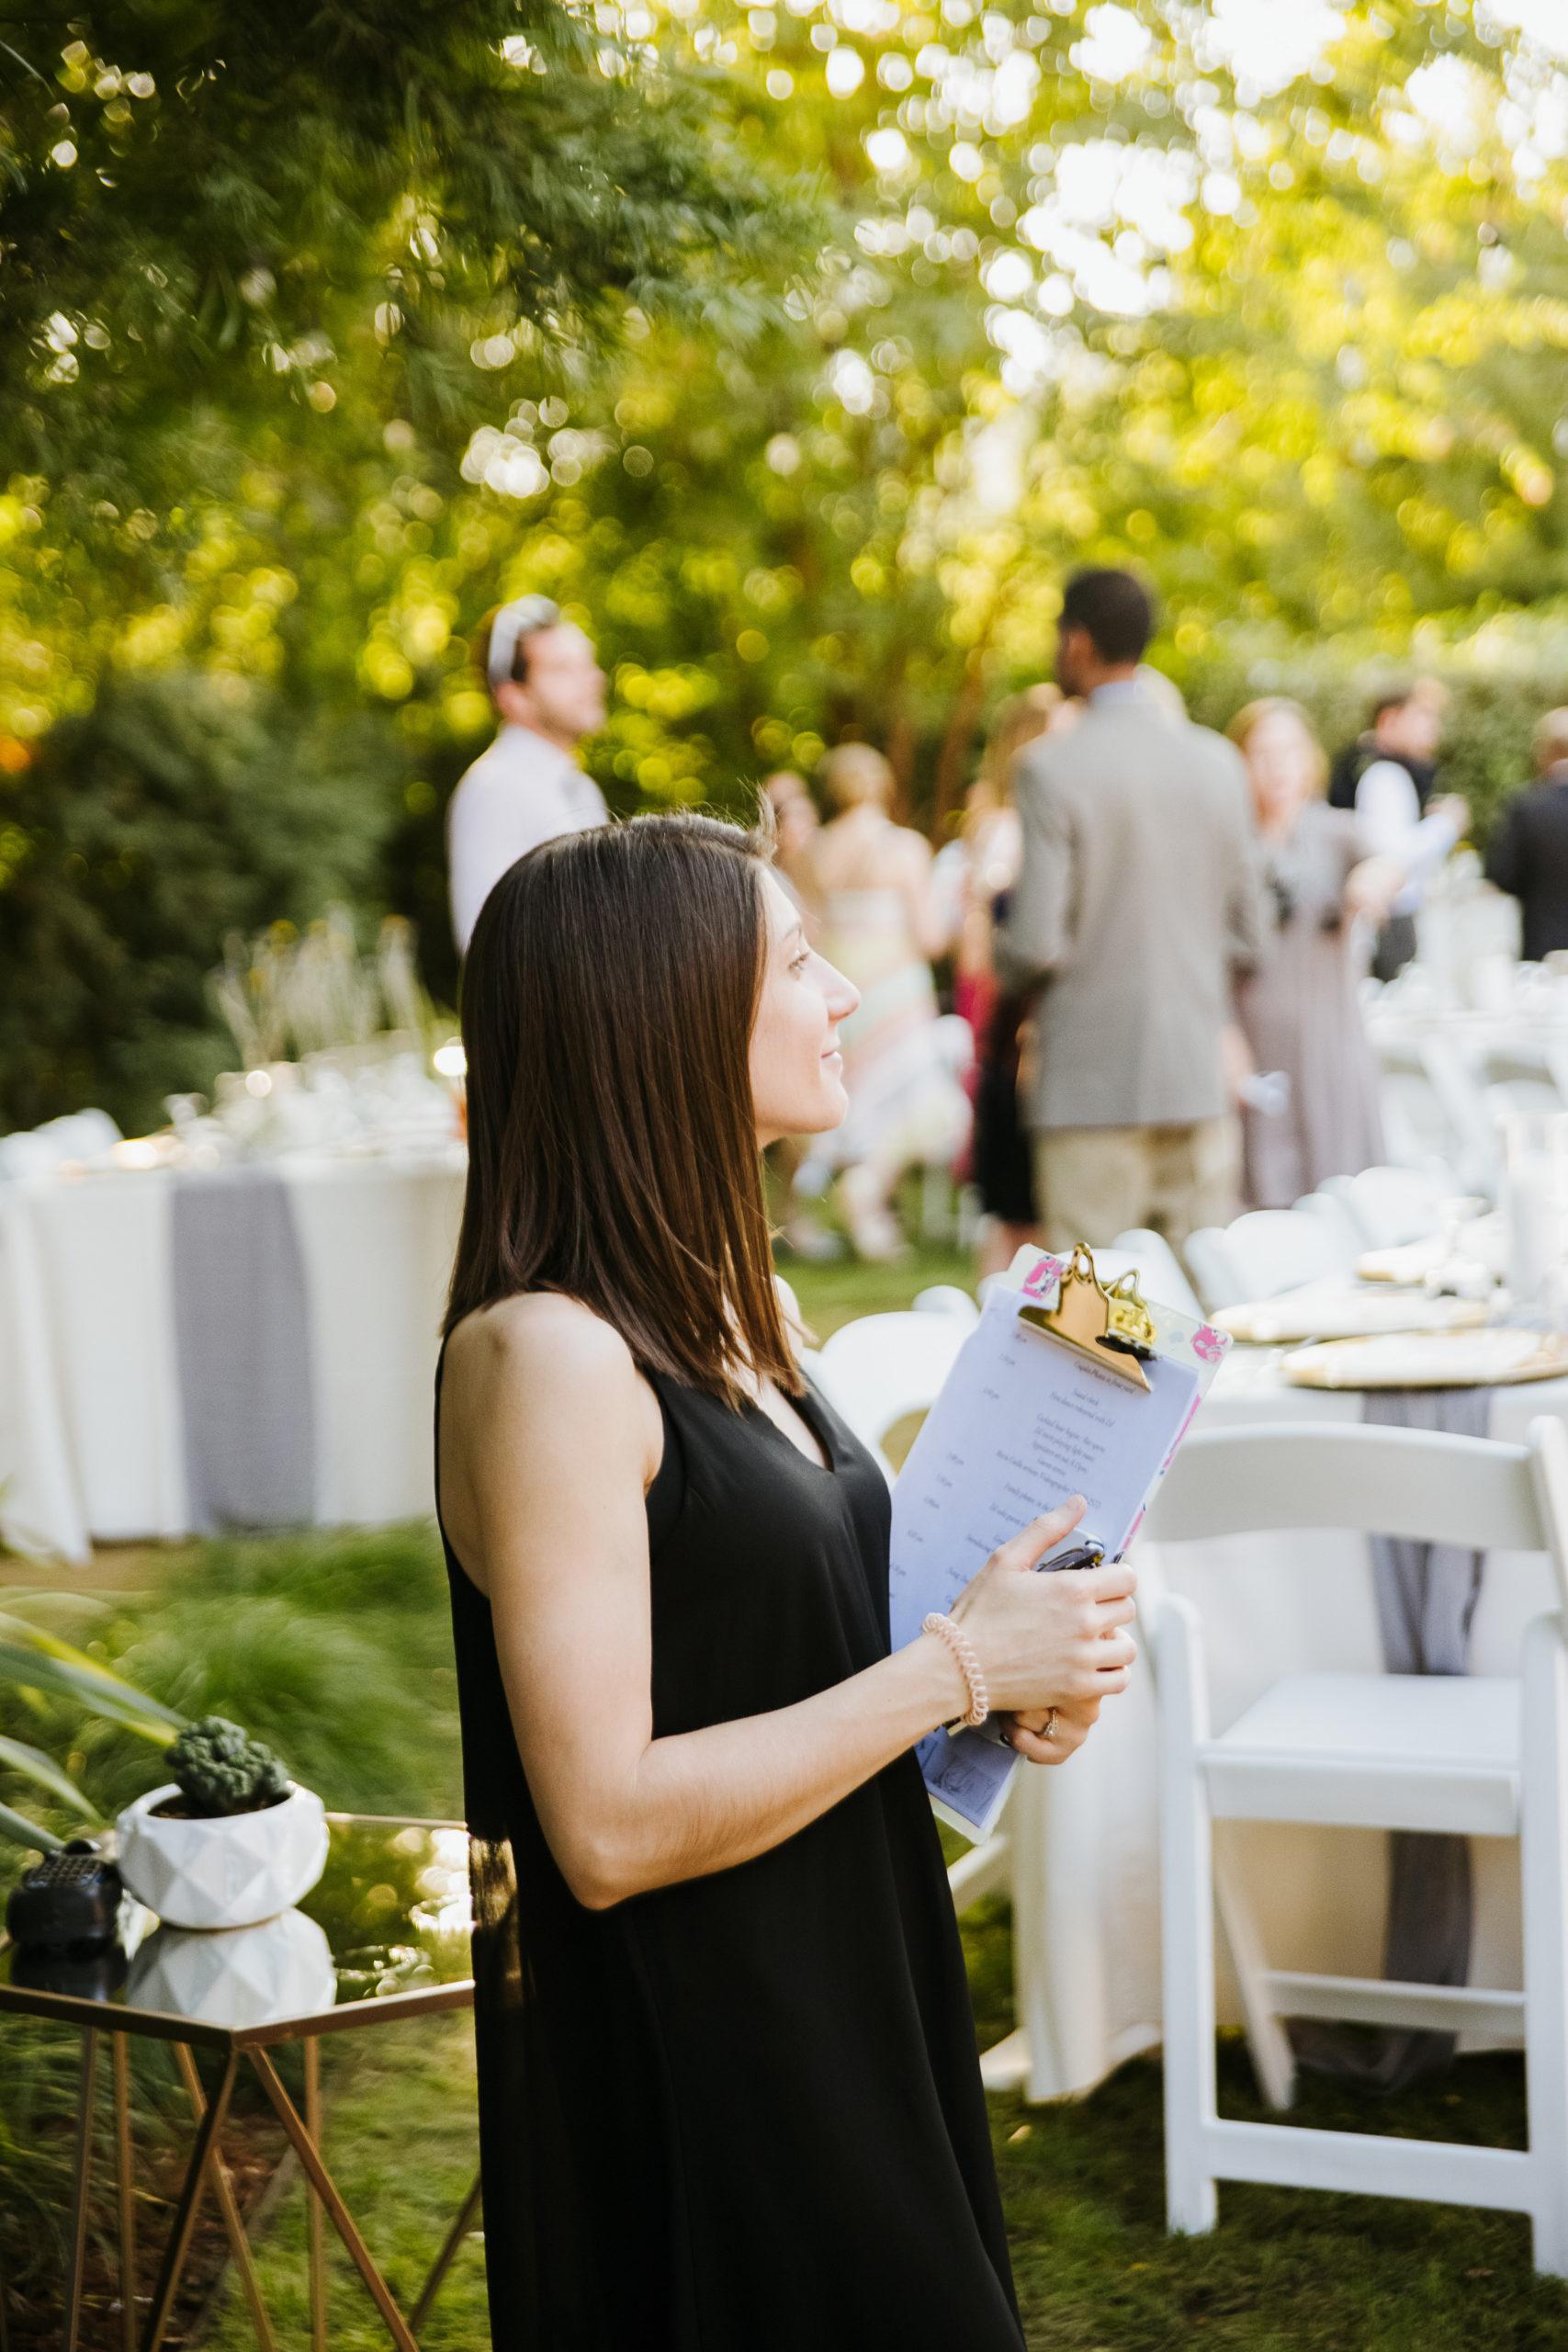 Wedding planner at reception